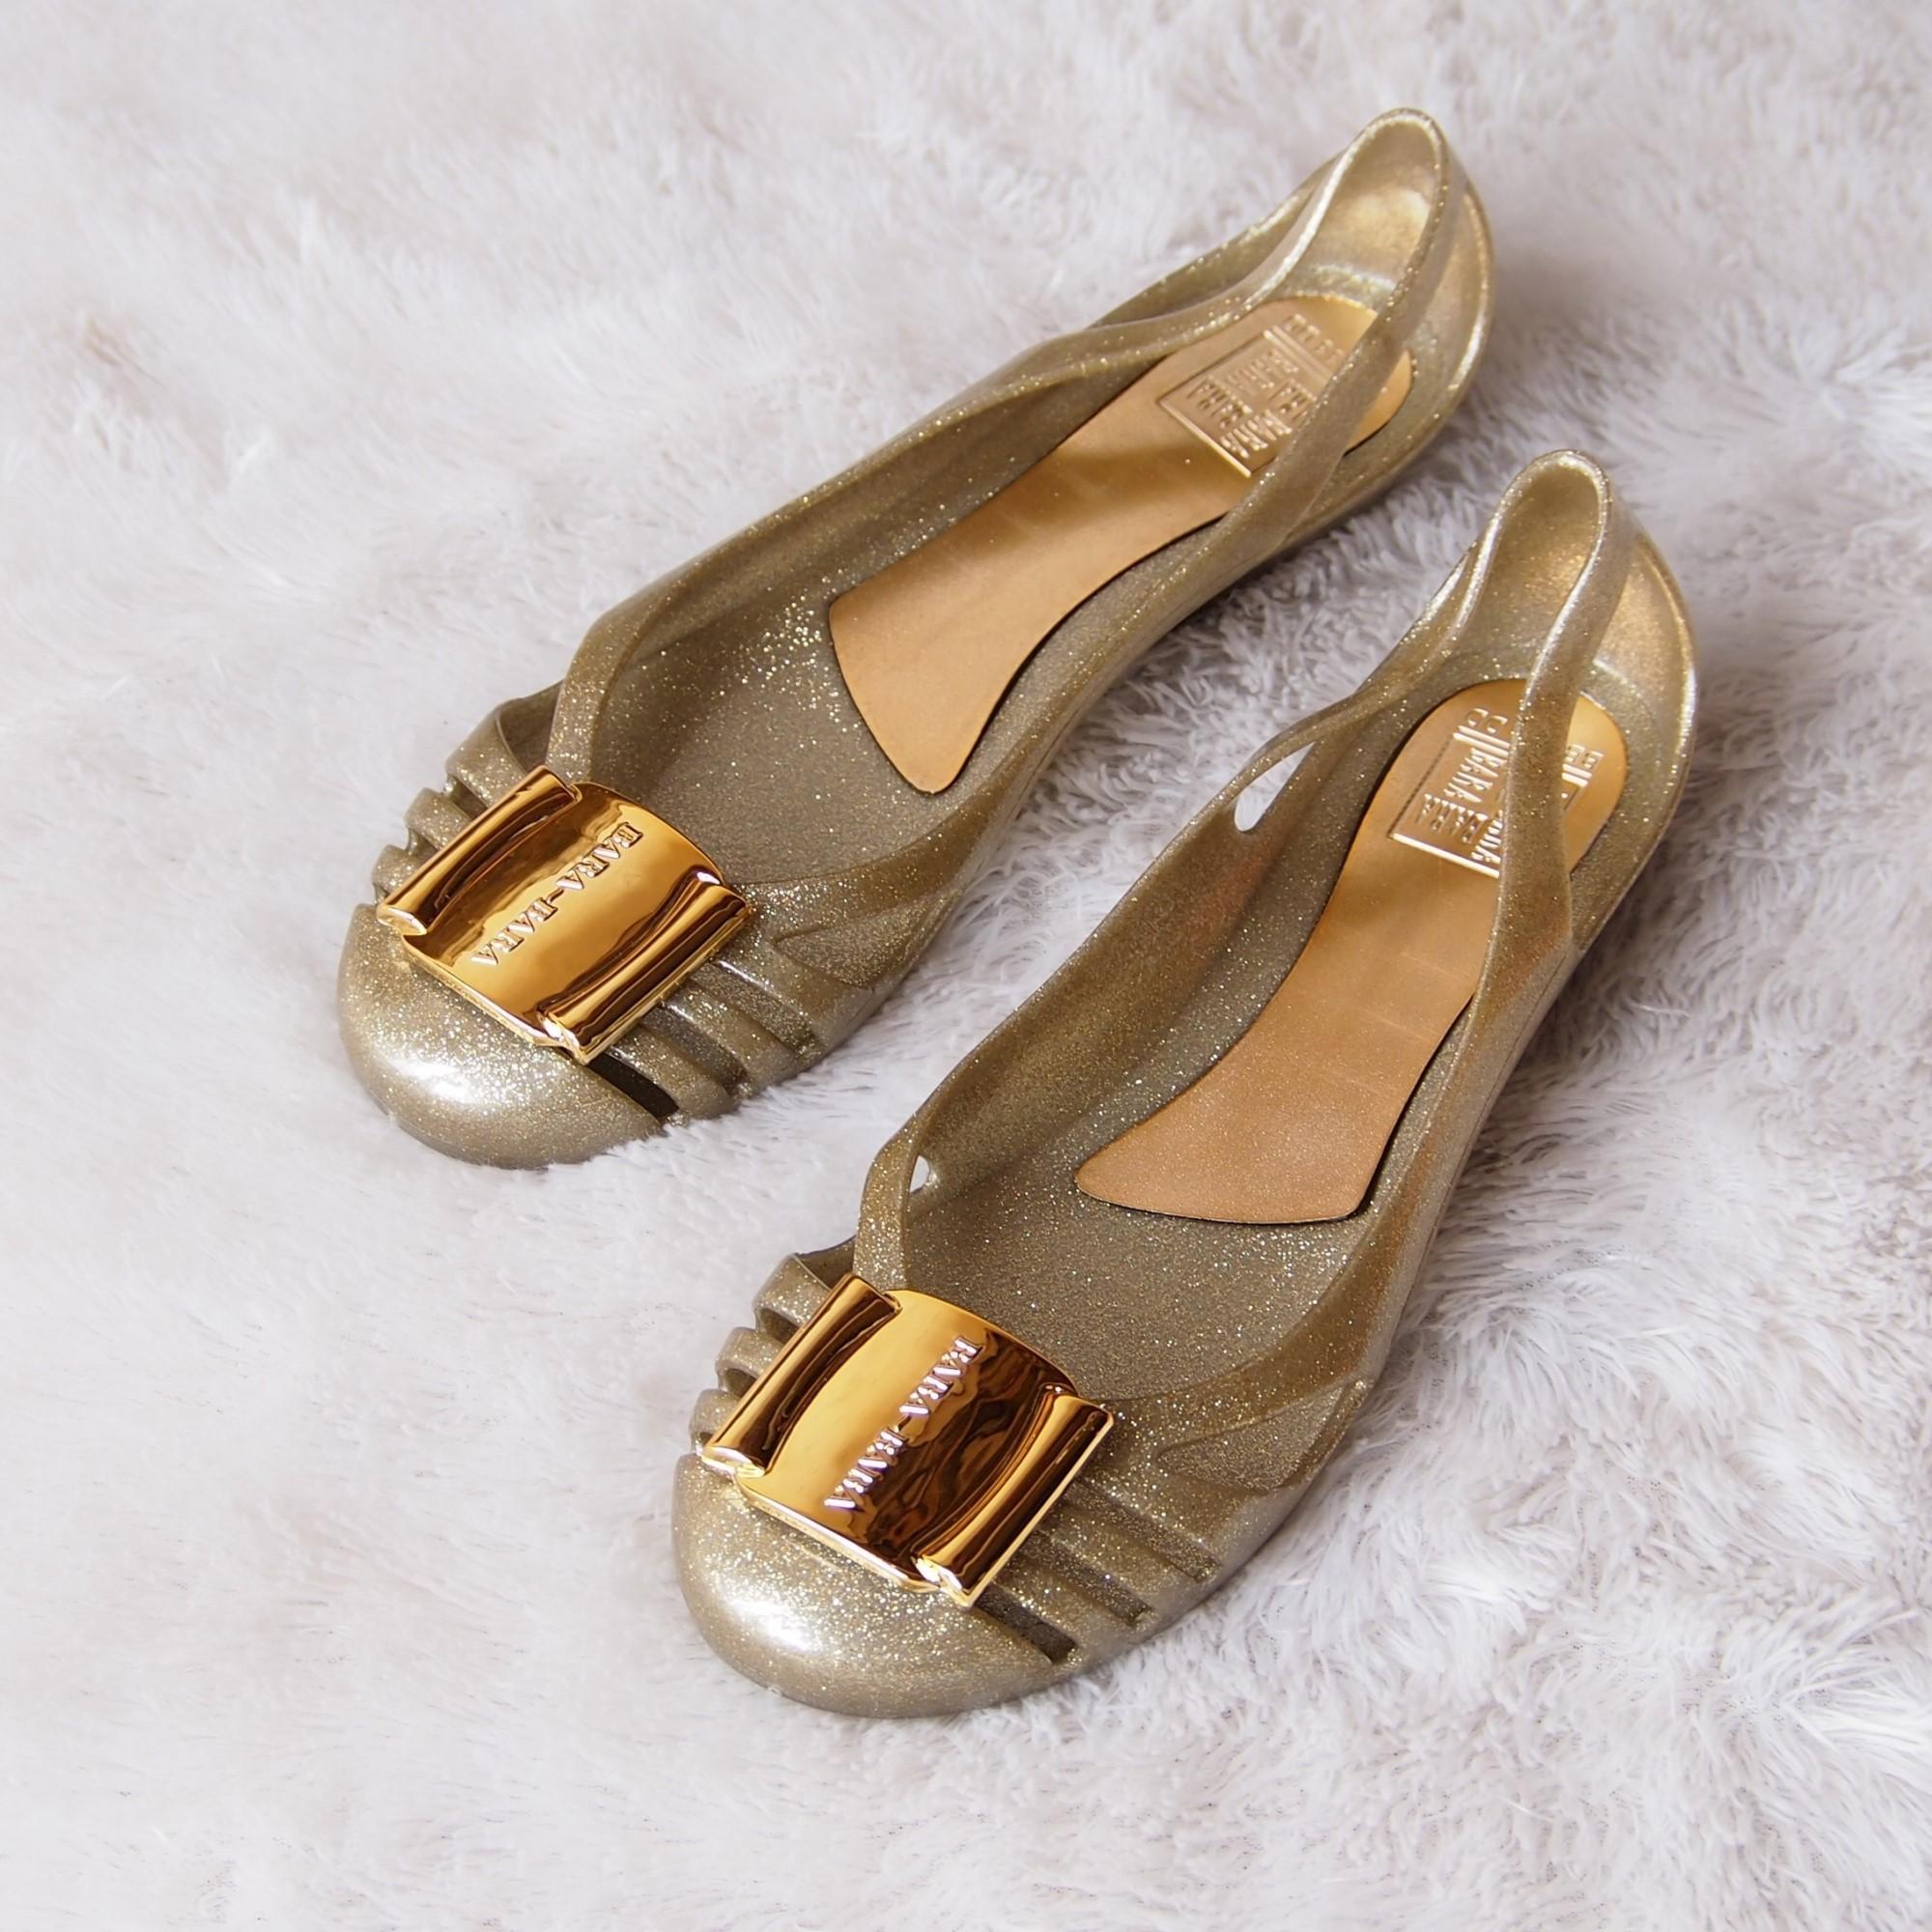 Jelly Shoes Bara Bara - Flat Shoes Jelly Wanita Glitter BB333GL2W